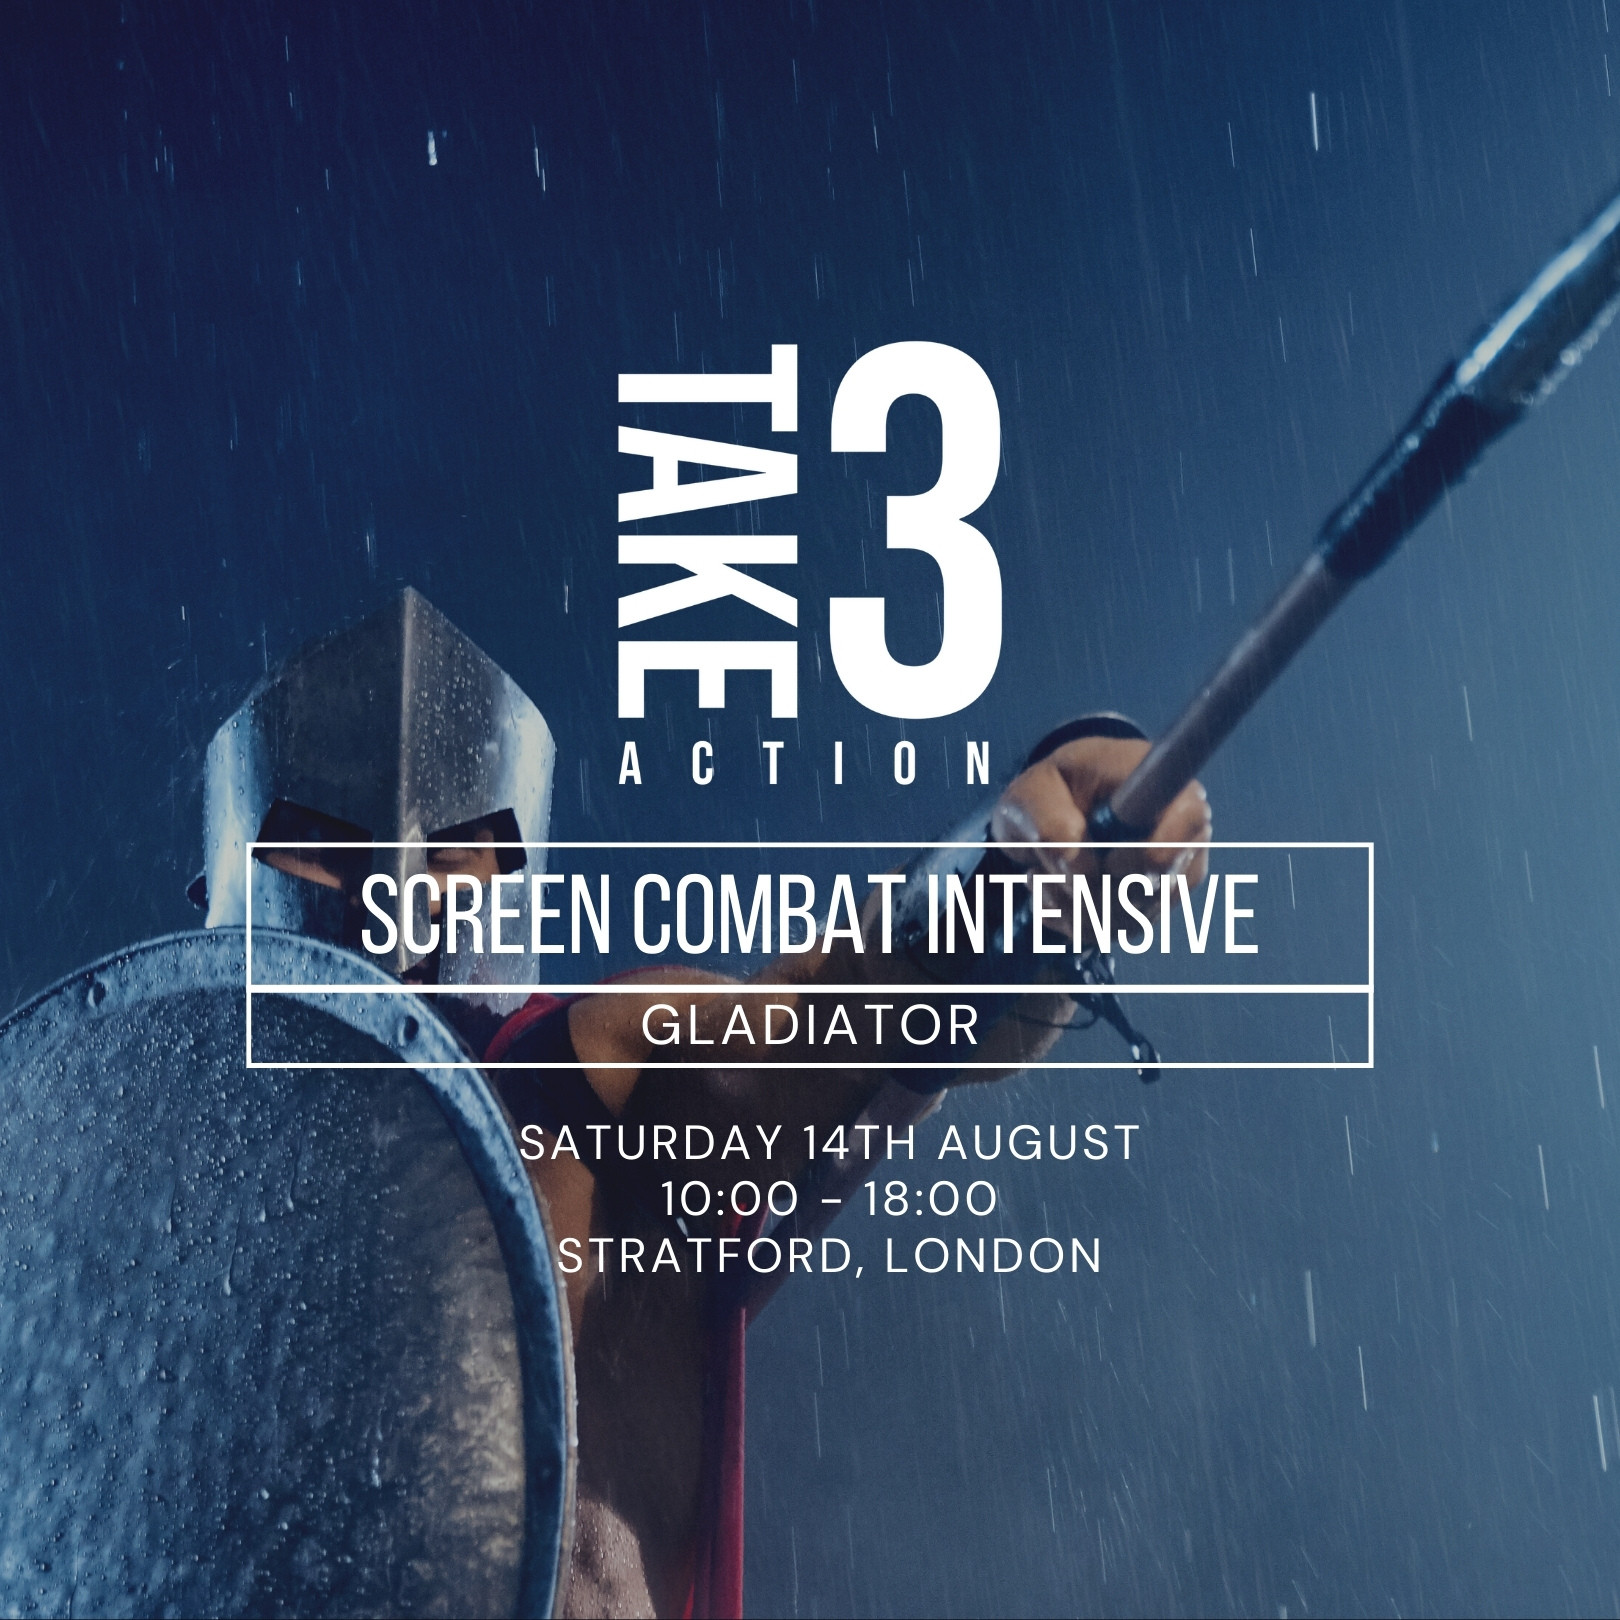 Screen Combat Intensive - Gladiator